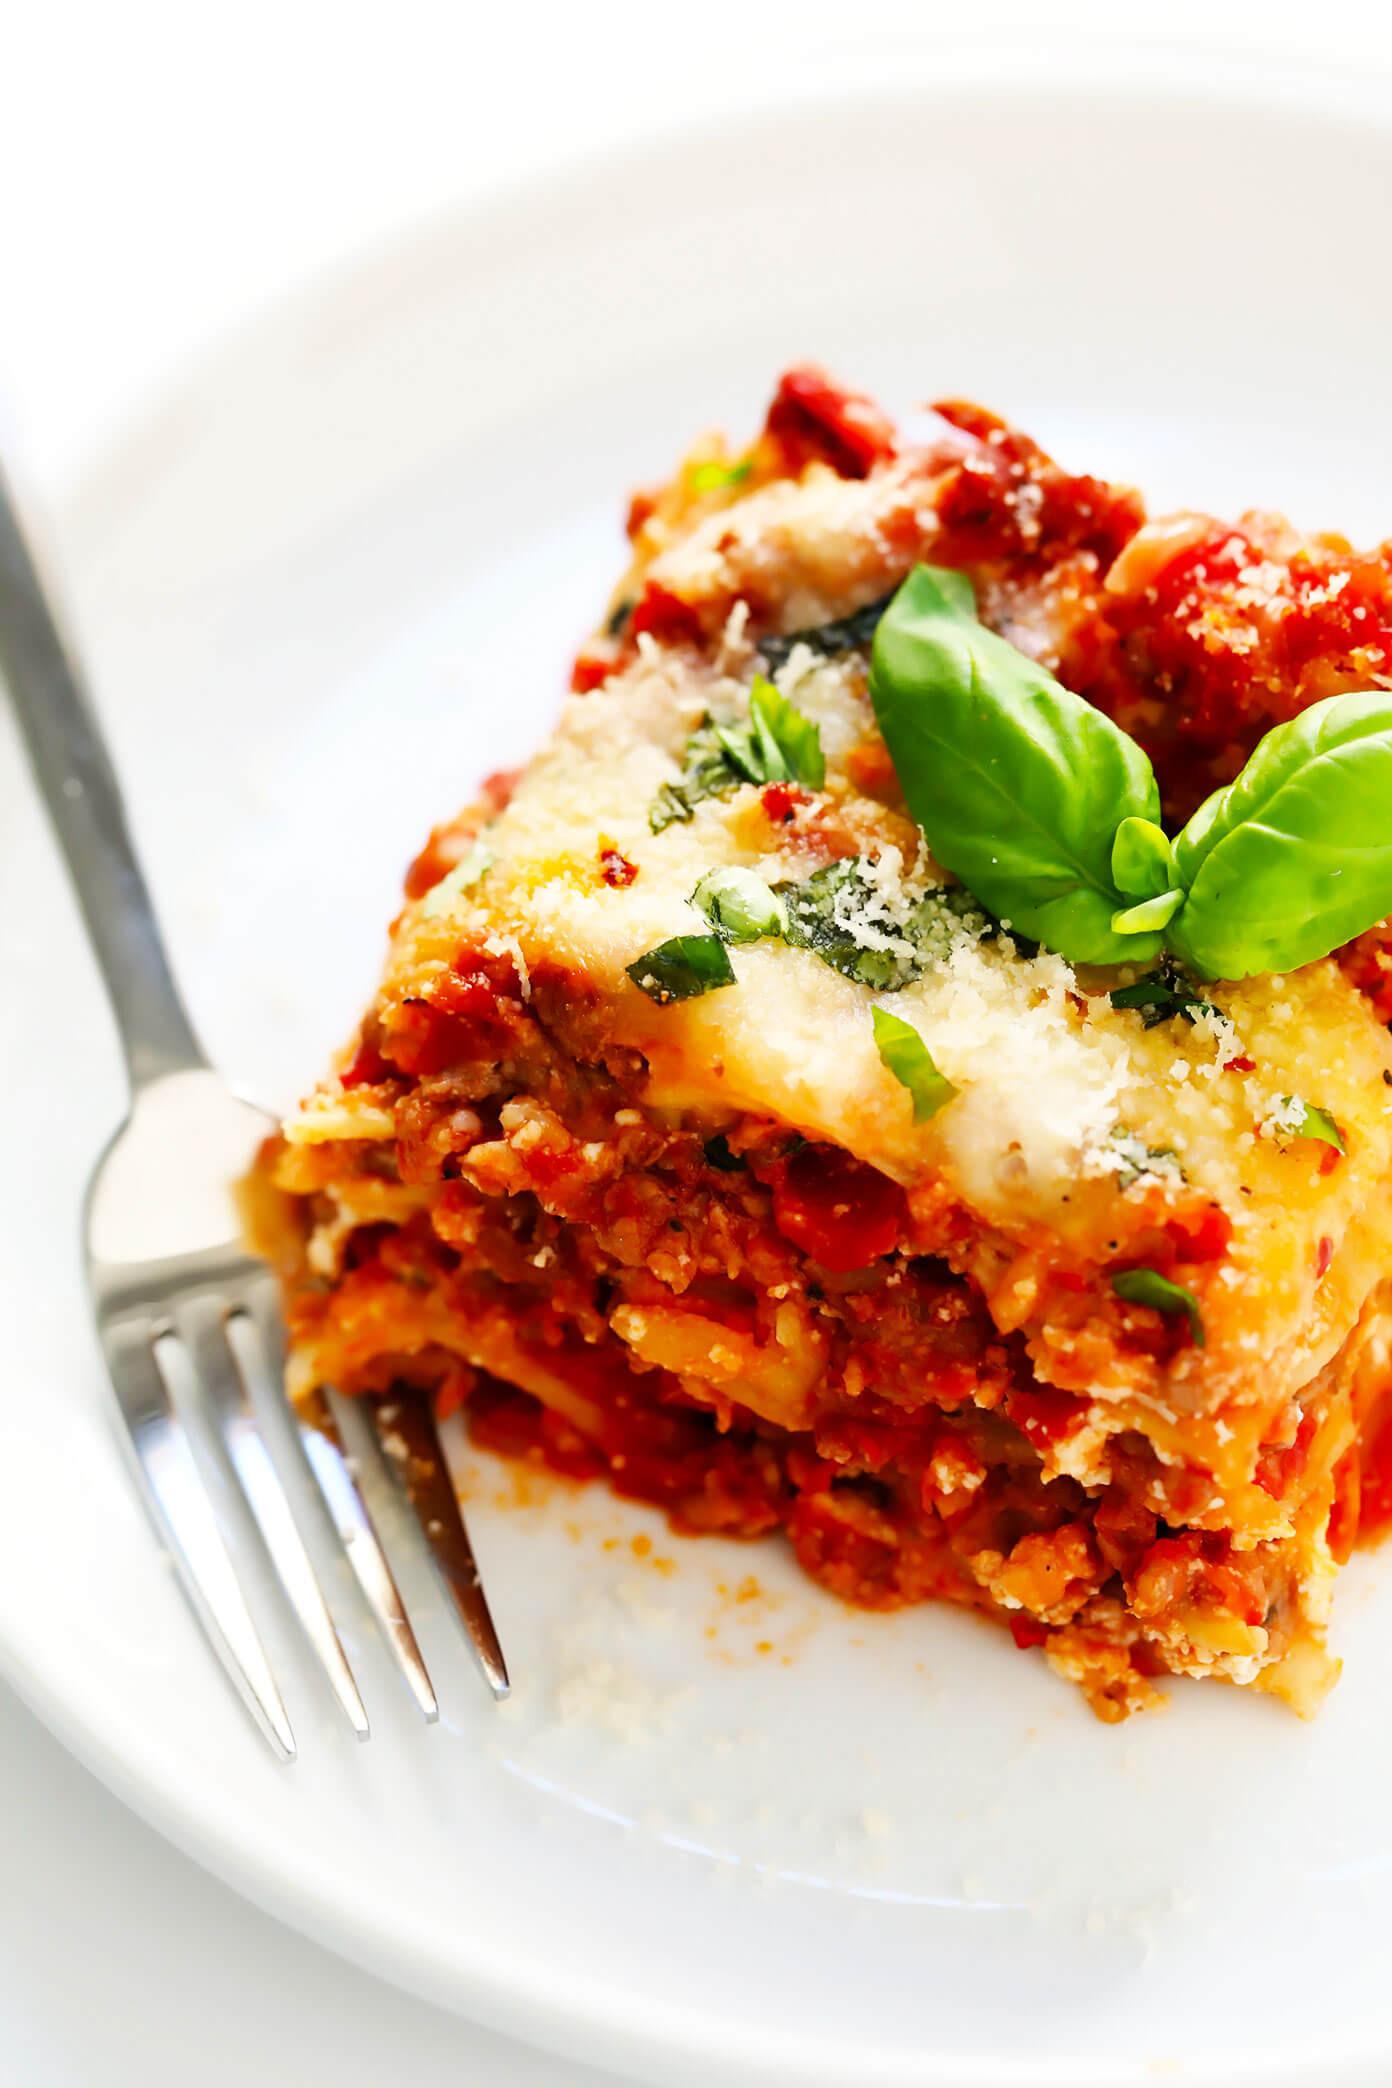 Vegetarian Lasagna Epicurious  The BEST Lasagna